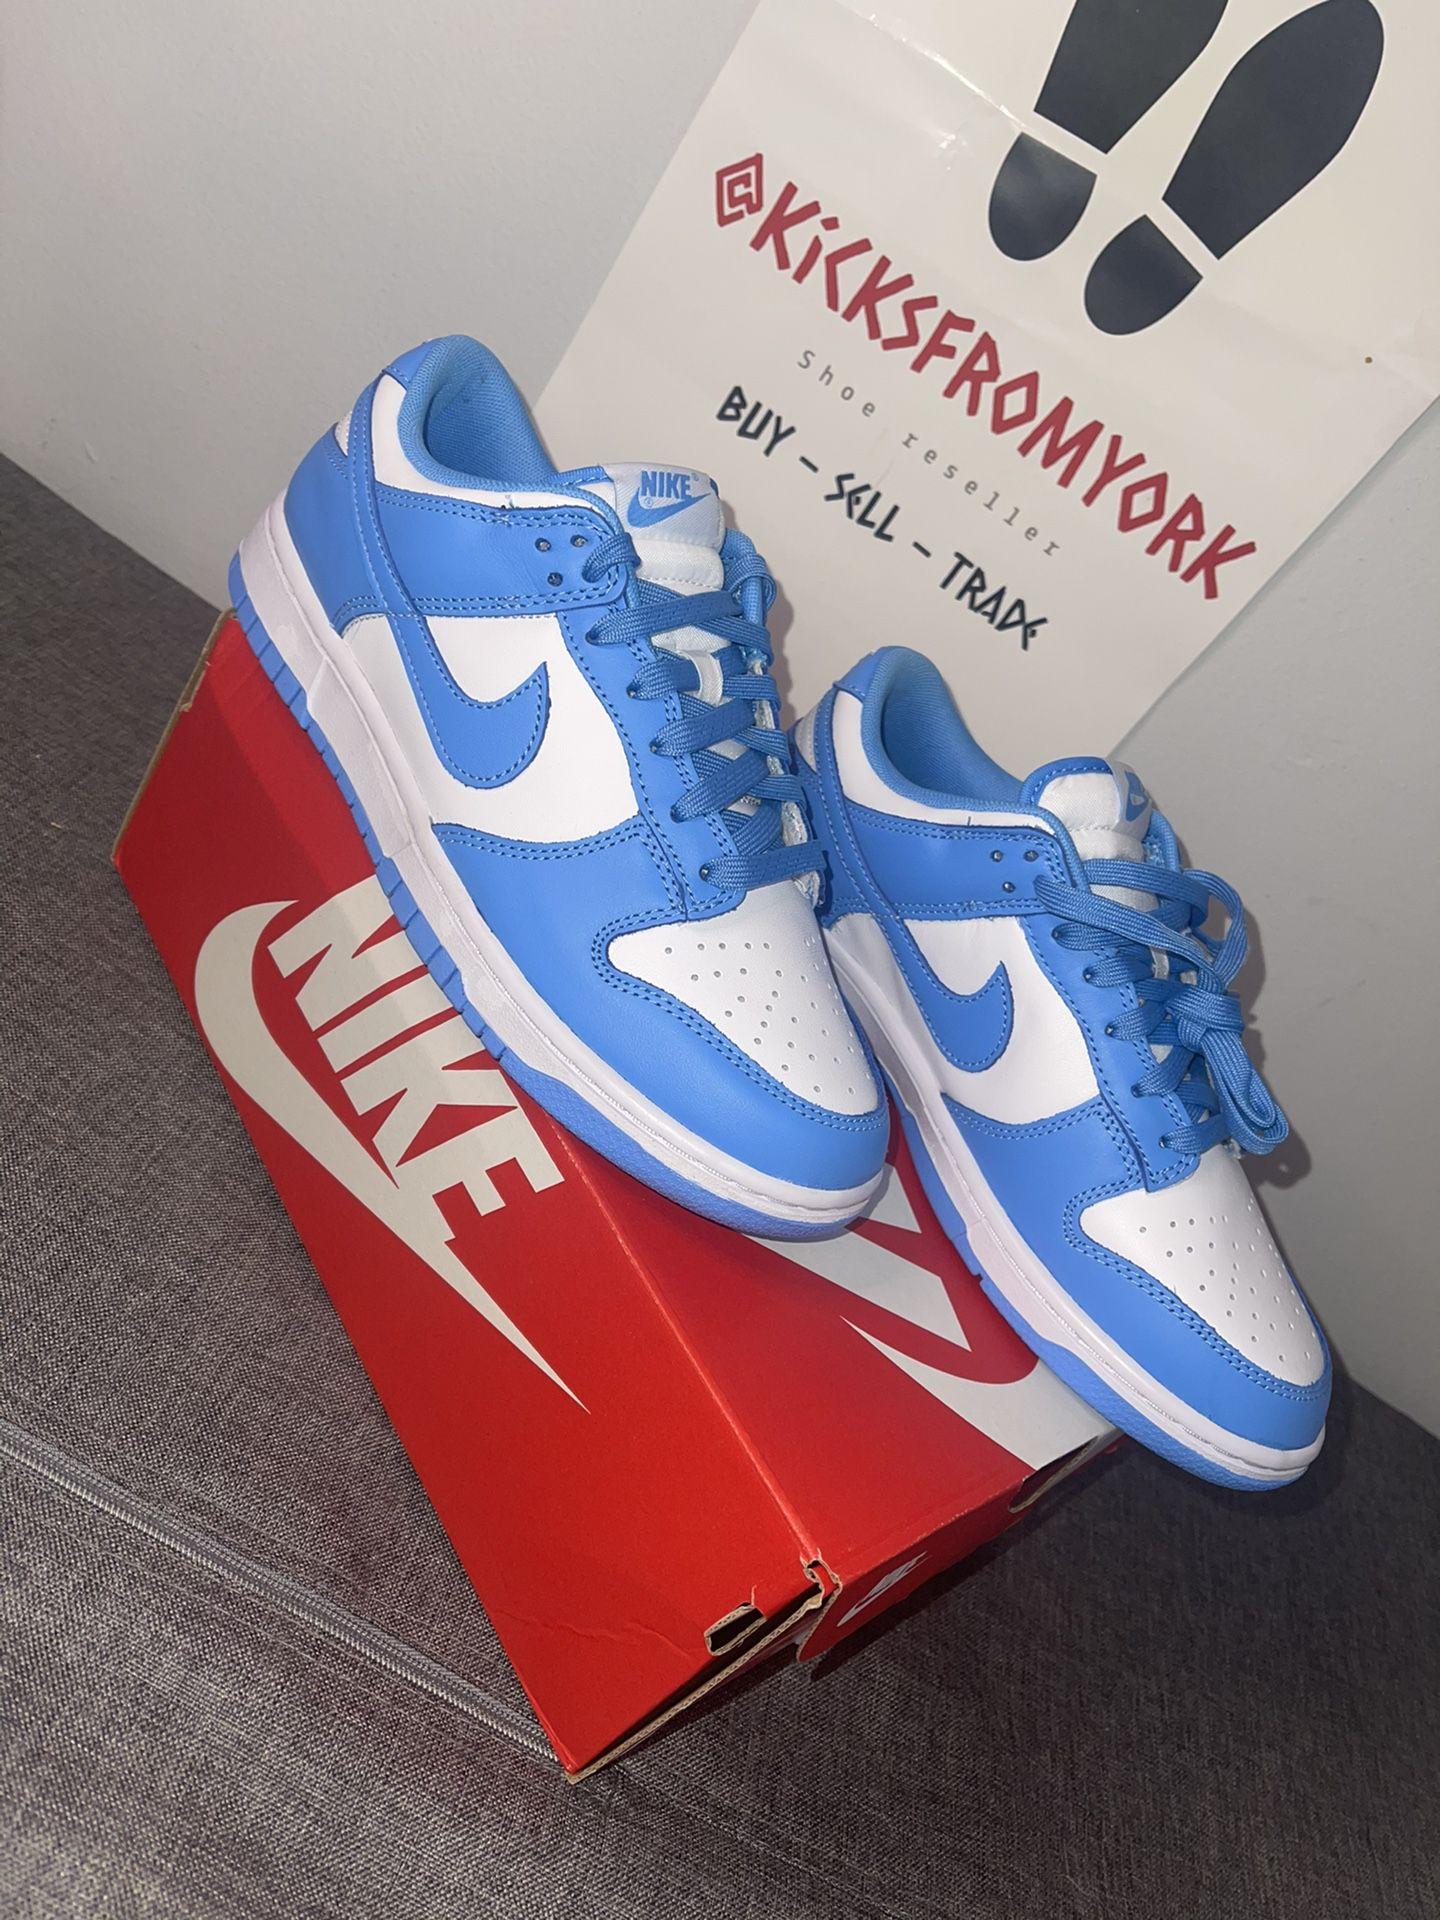 Nike Dunk Unc